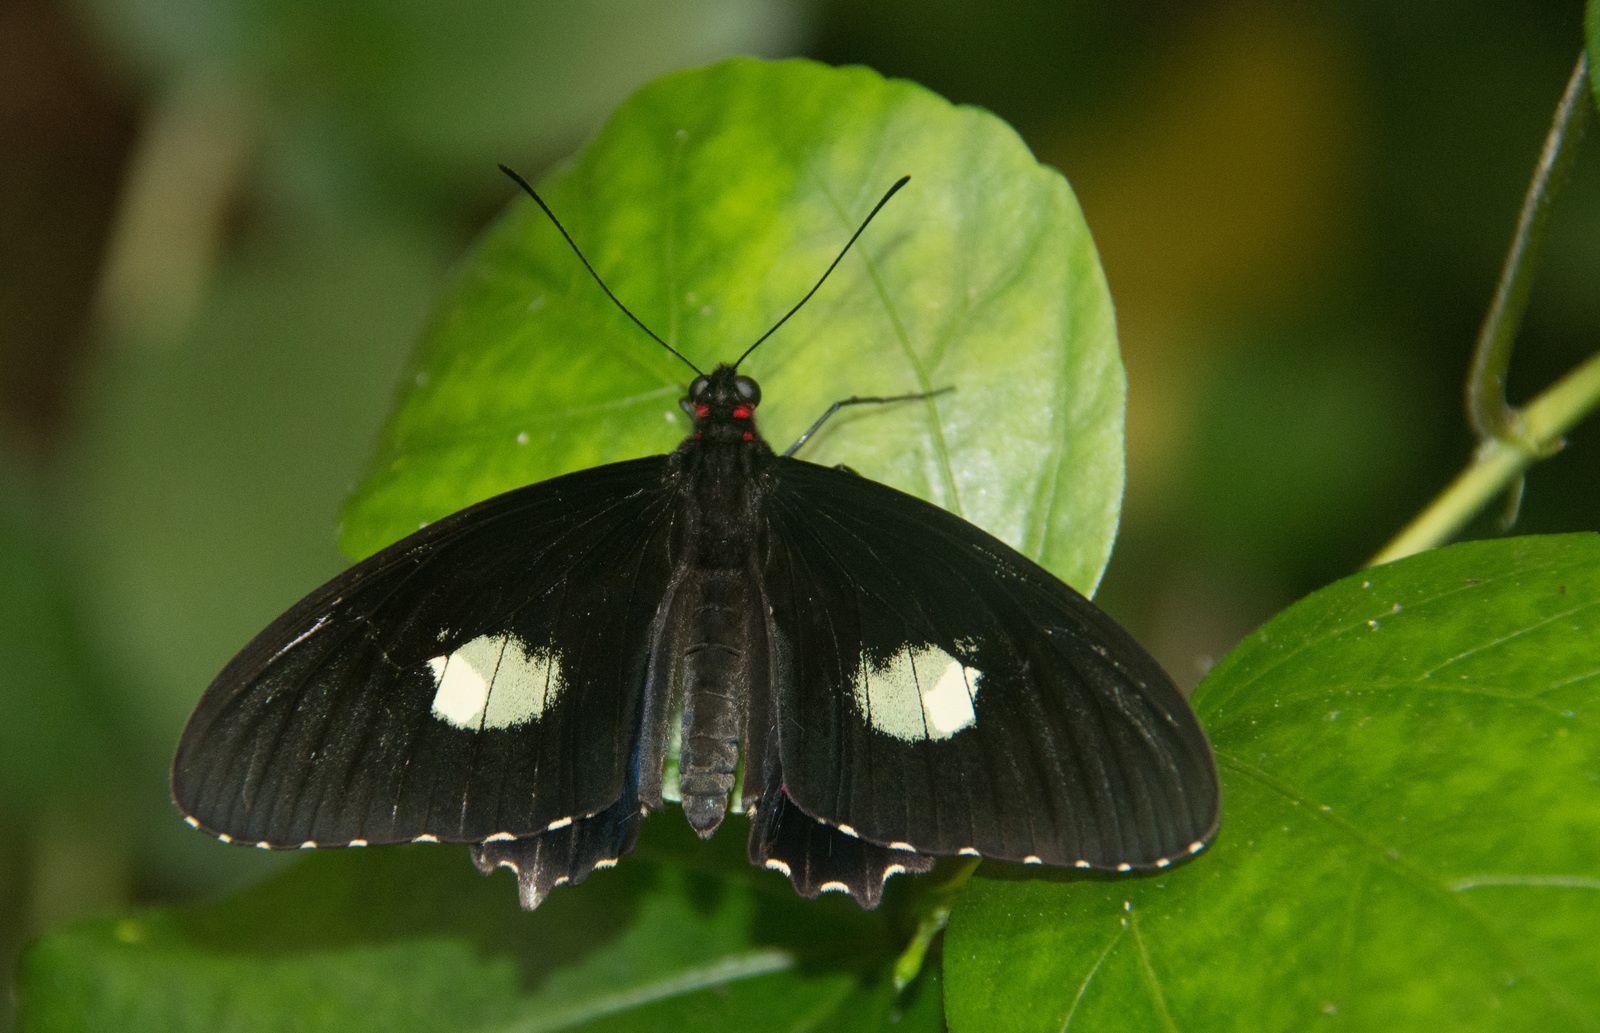 Best off papillons du monde